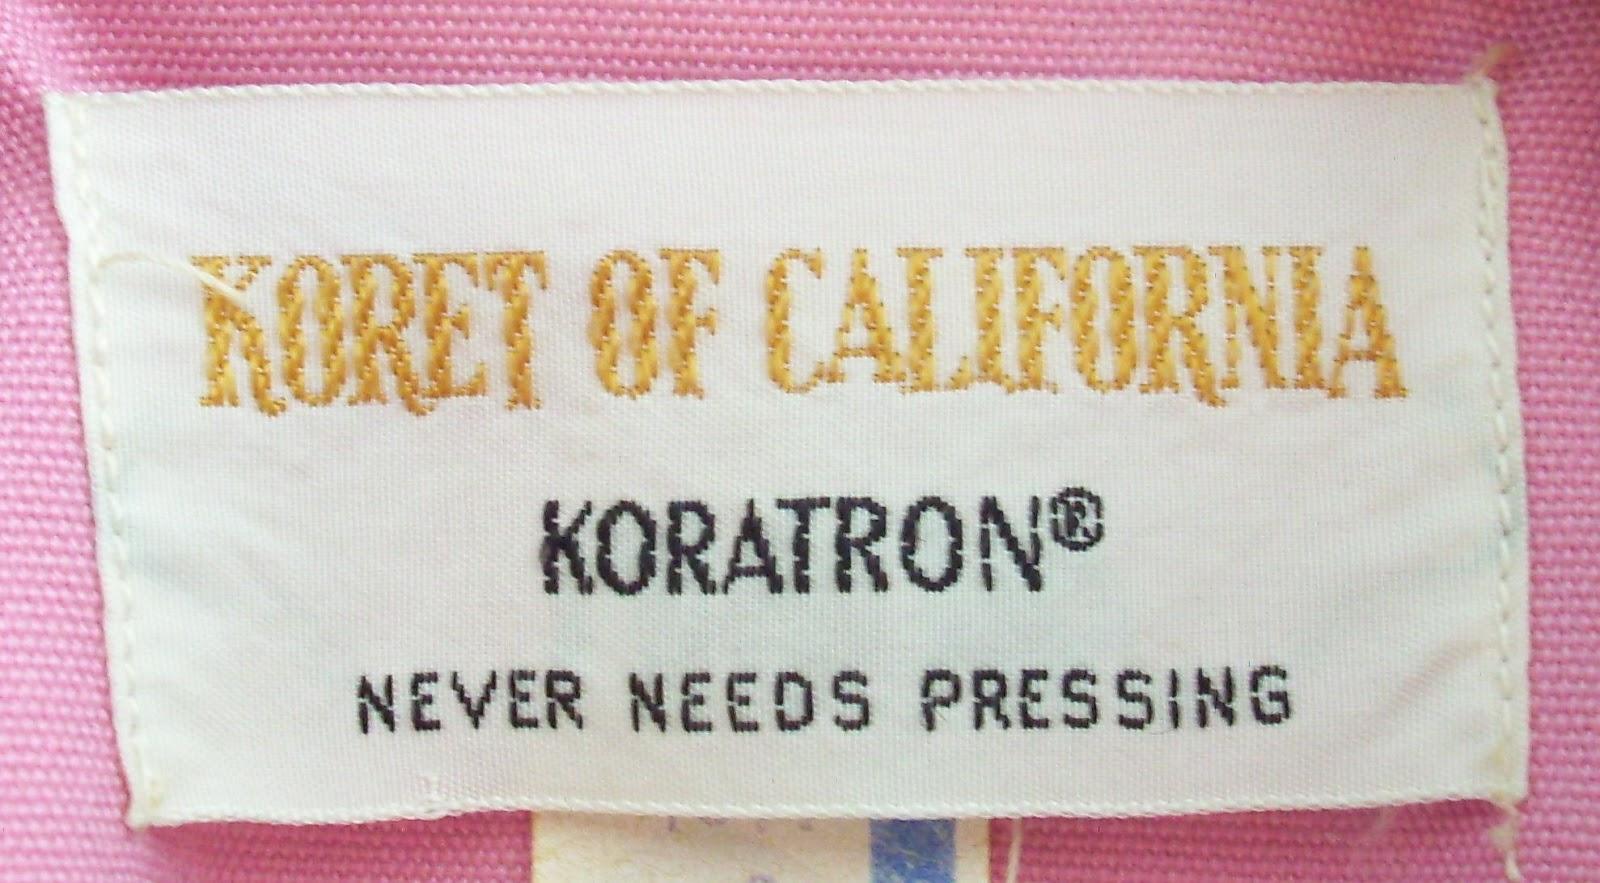 pendleton tag identification